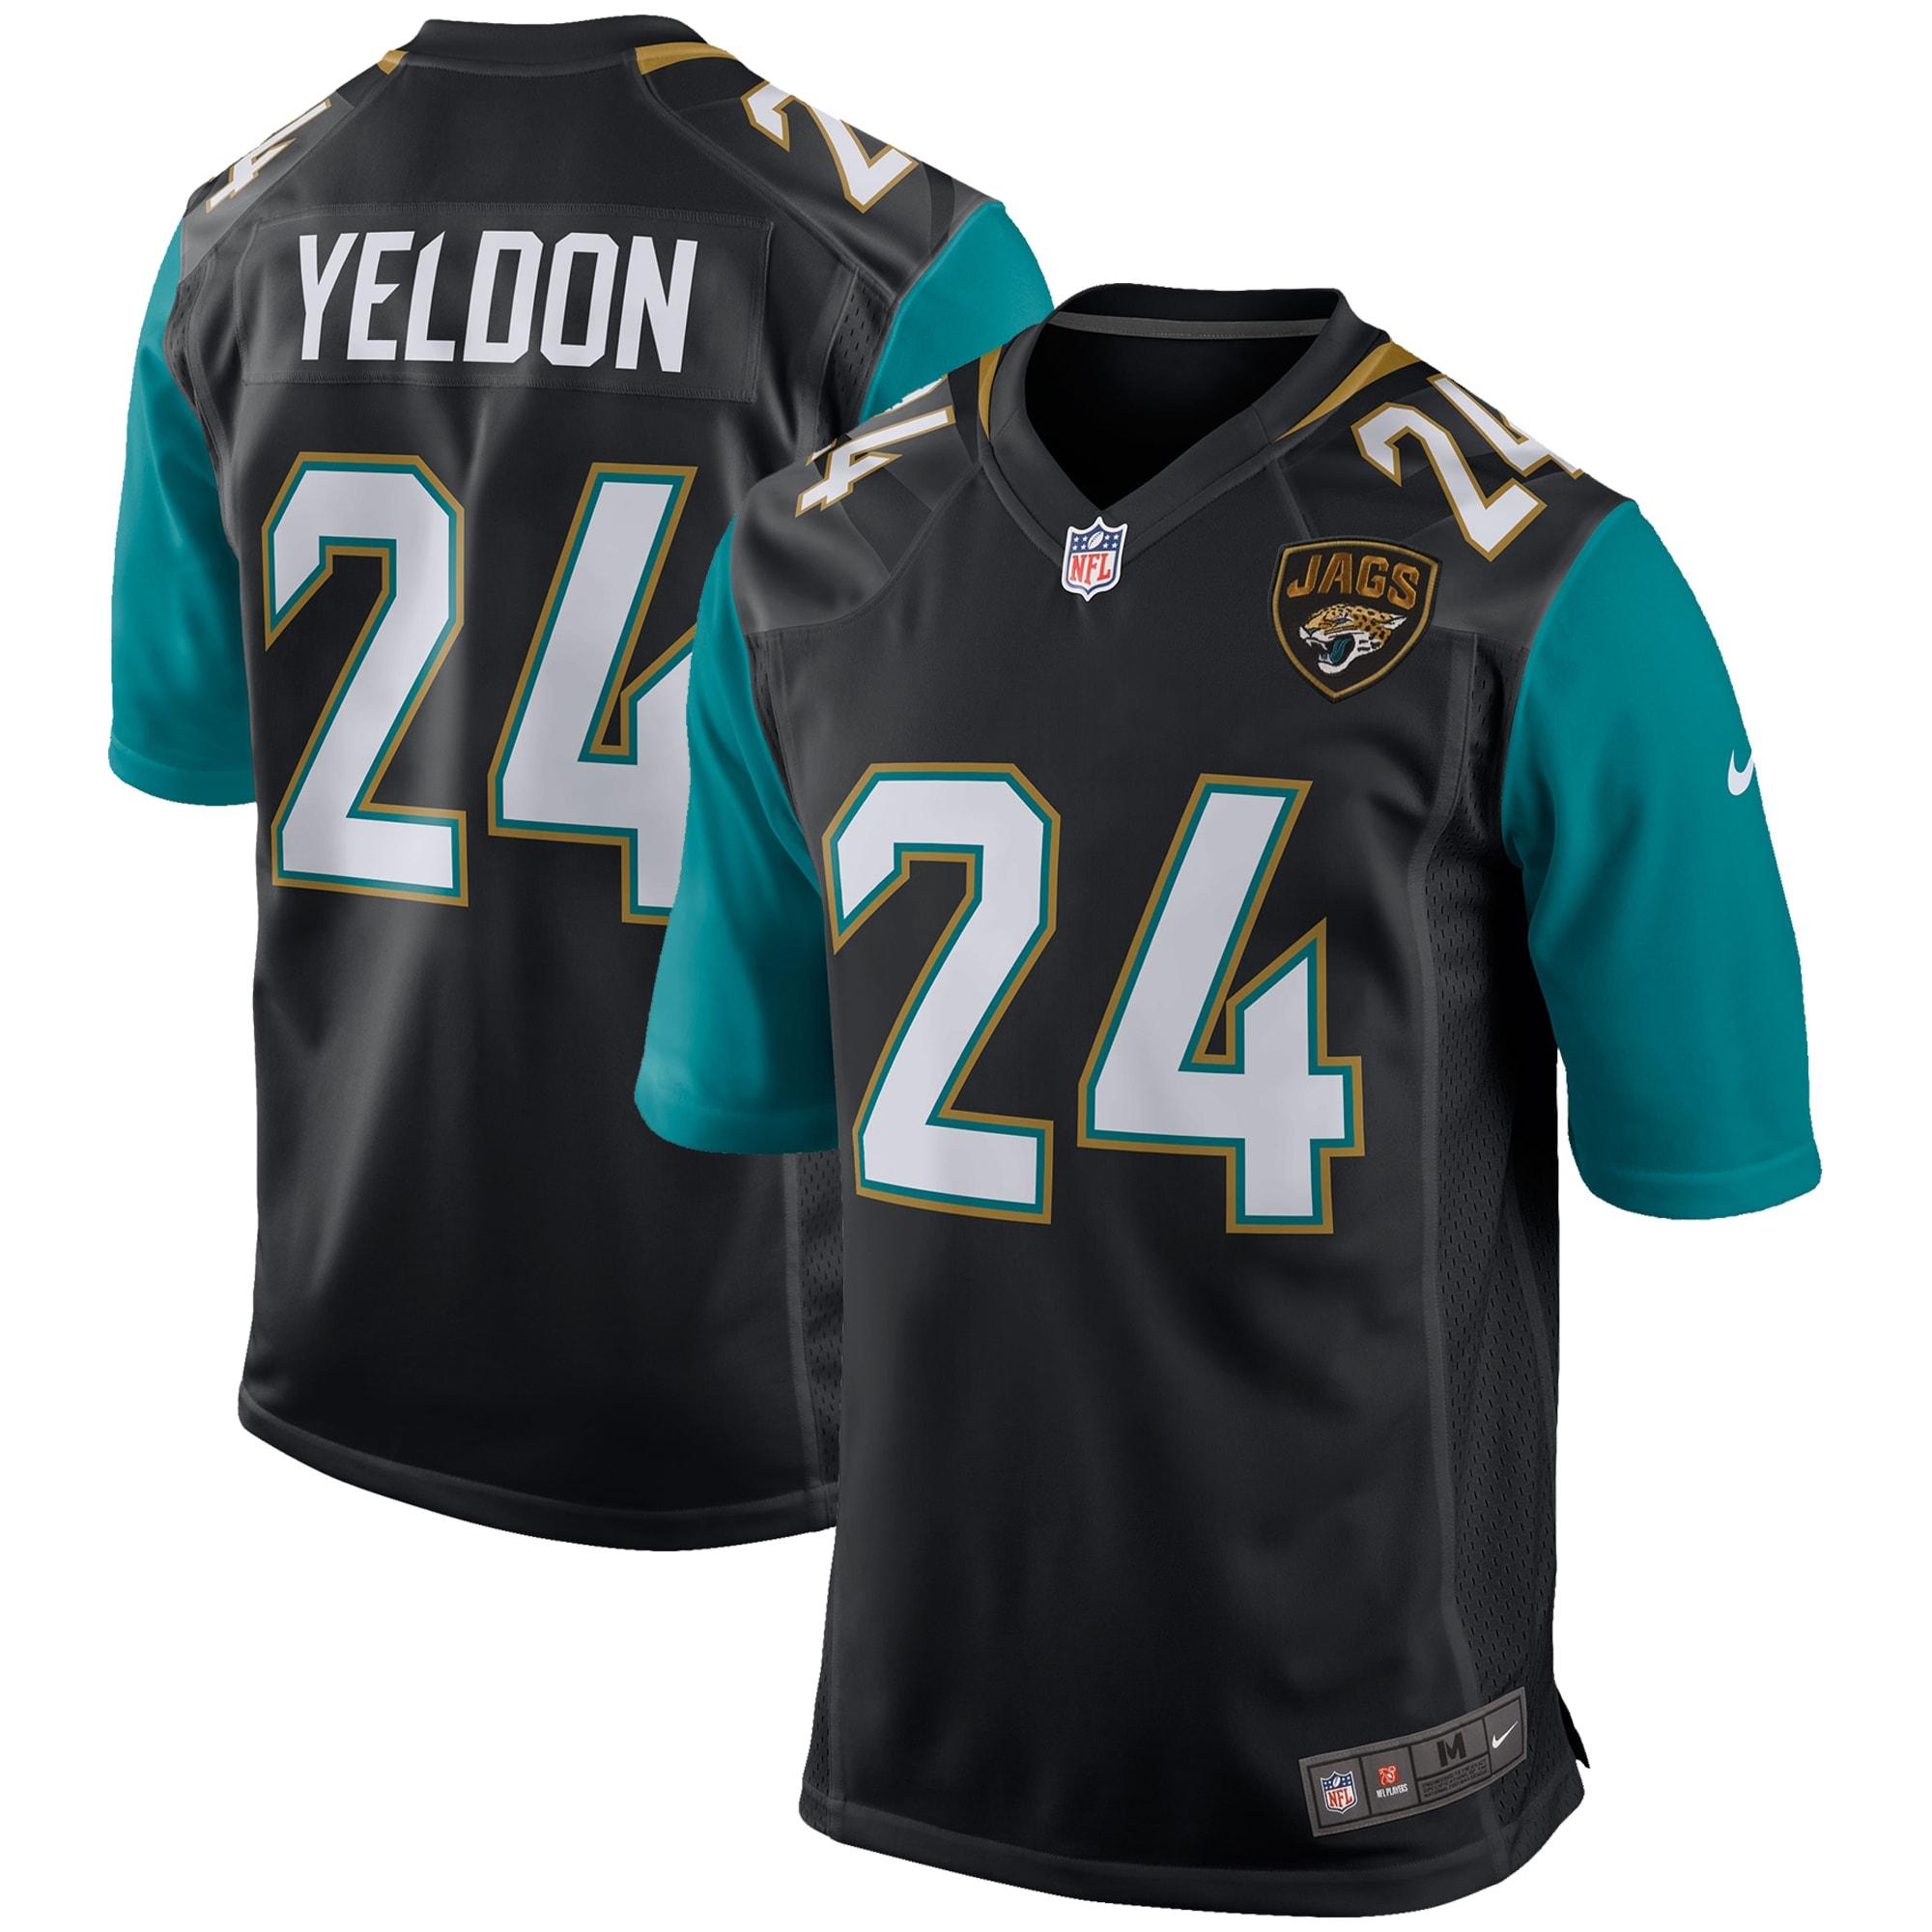 T.J. Yeldon Jacksonville Jaguars Nike Youth Game Jersey - Black